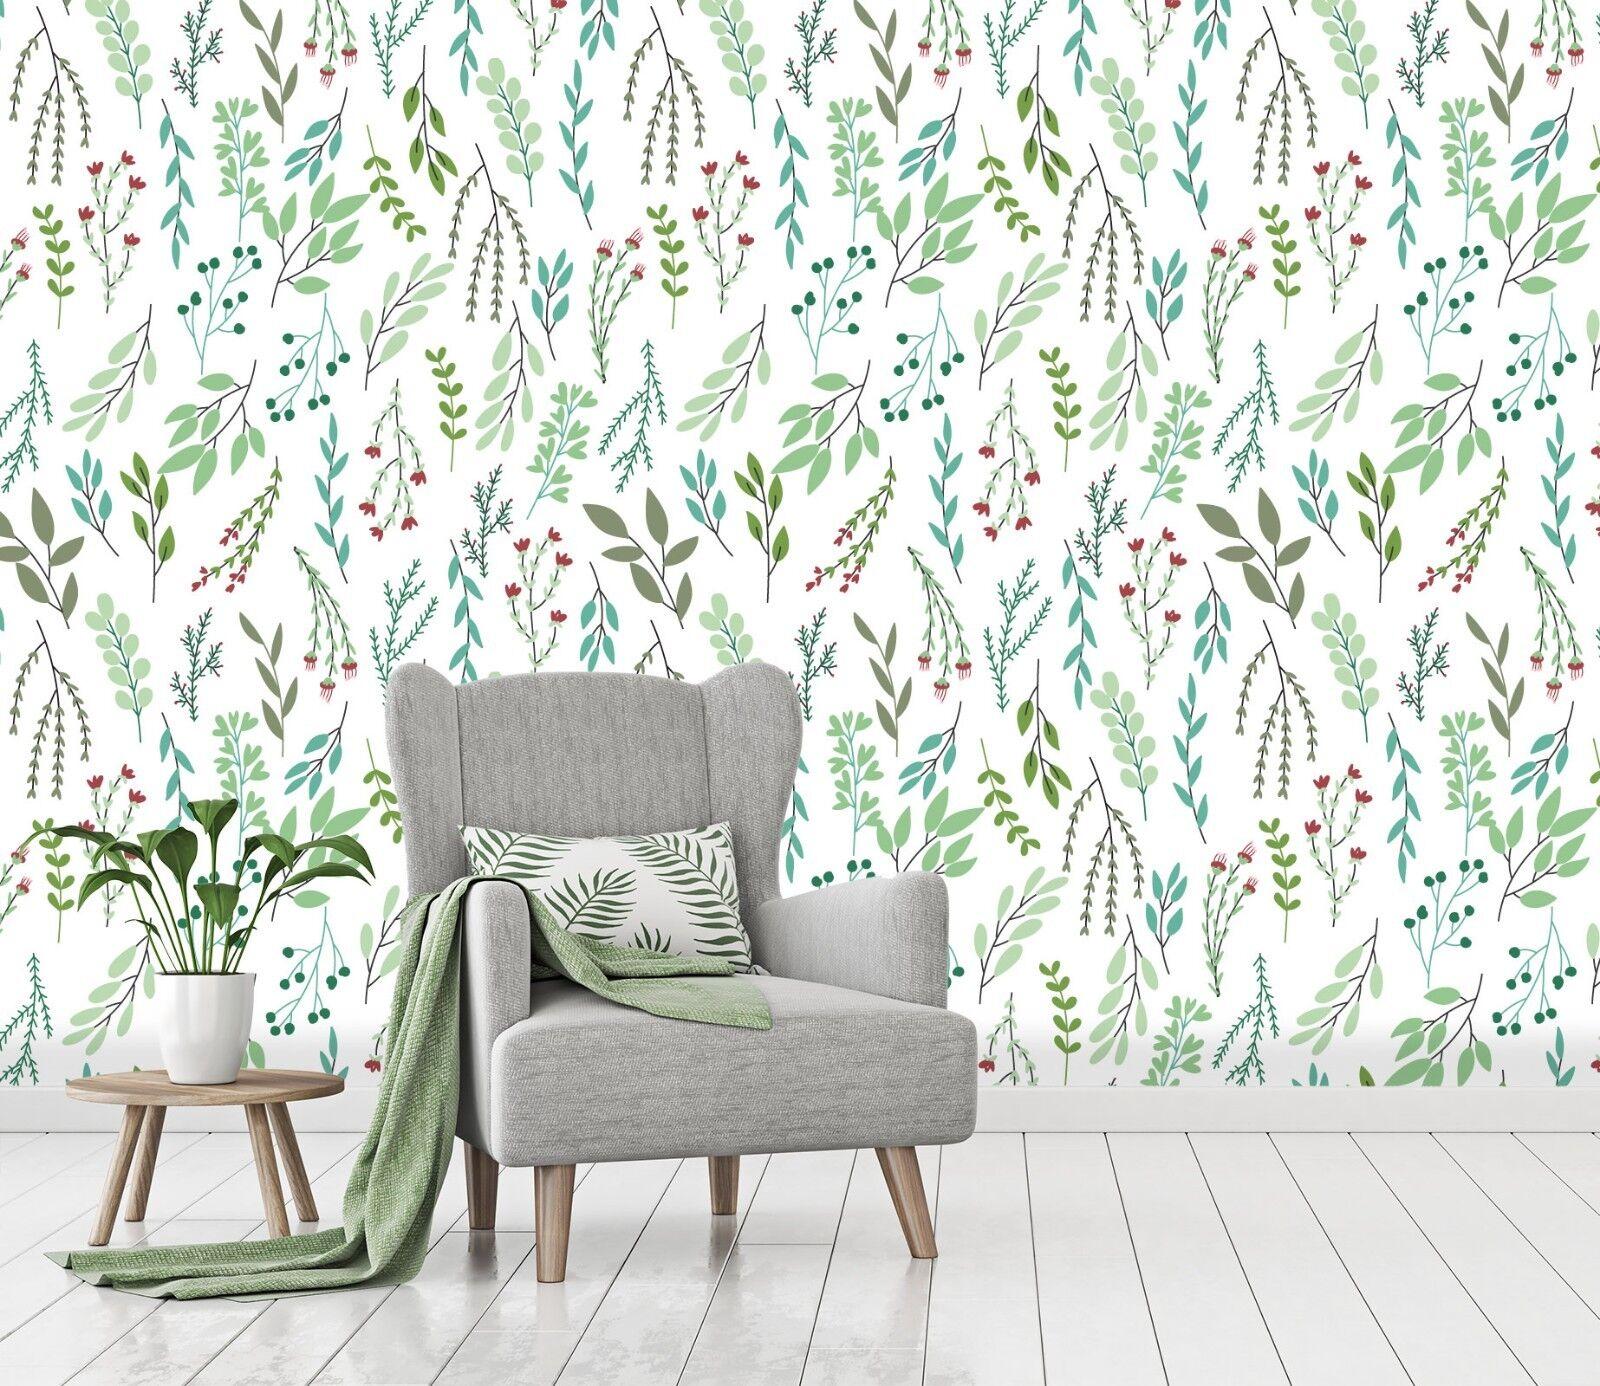 3D Frische Grüne Blätter 332 Tapete Wandgemälde Tapete Tapeten Familie Kinde DE